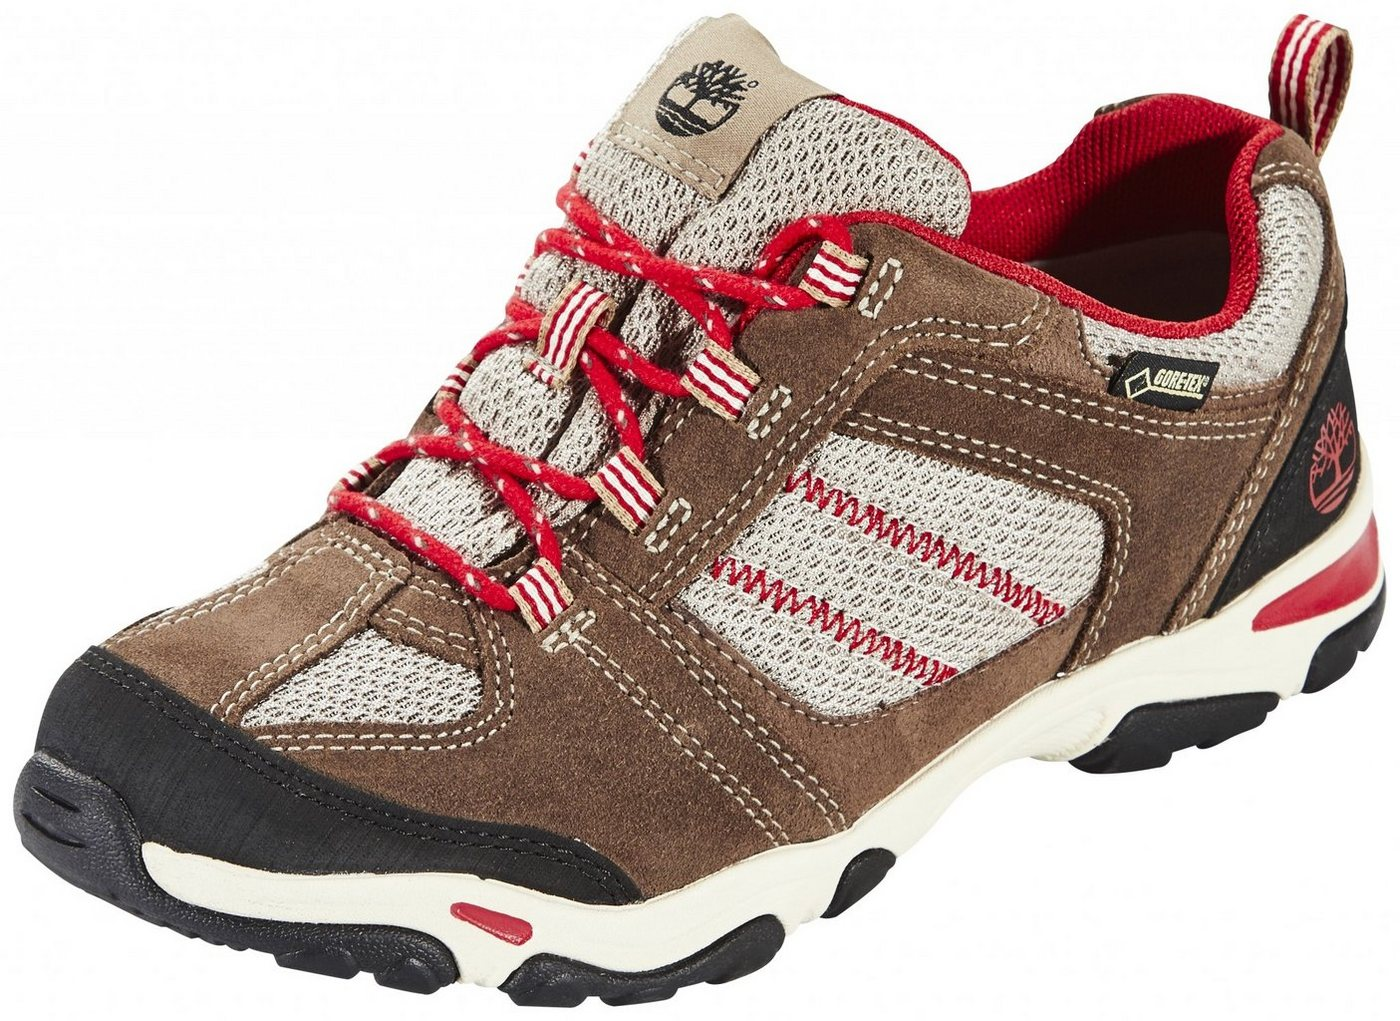 Timberland Kletterschuh »Trail Force F/L Shoes Juniors GTX« | Schuhe > Sportschuhe > Kletterschuhe | Schwarz | Ab - Leder - Gummi | Timberland